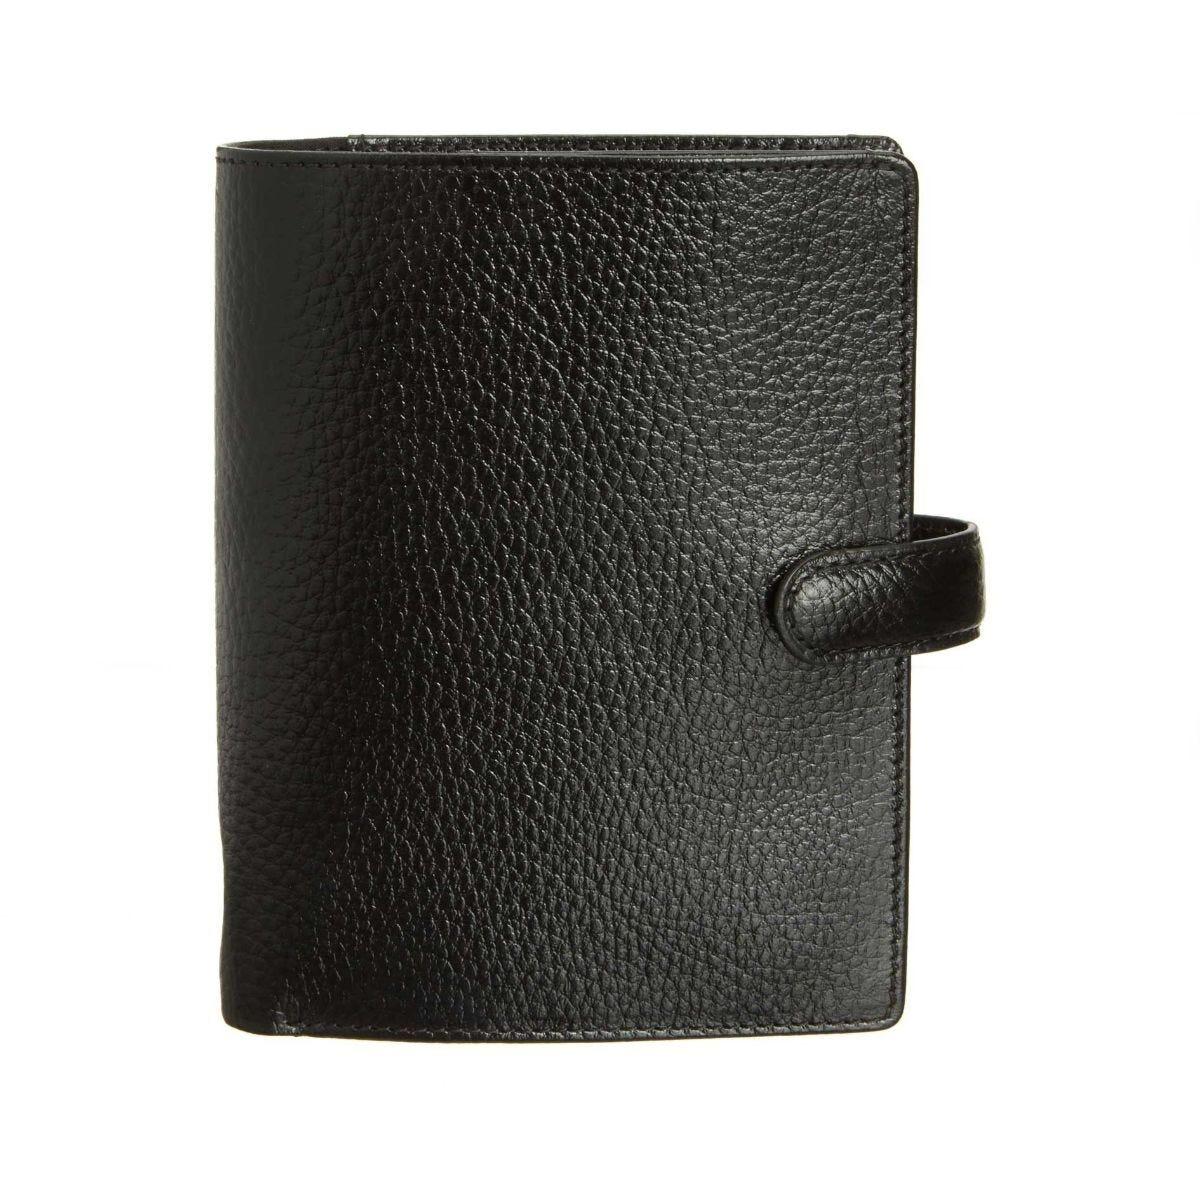 Filofax Finsbury Pocket Organiser Black